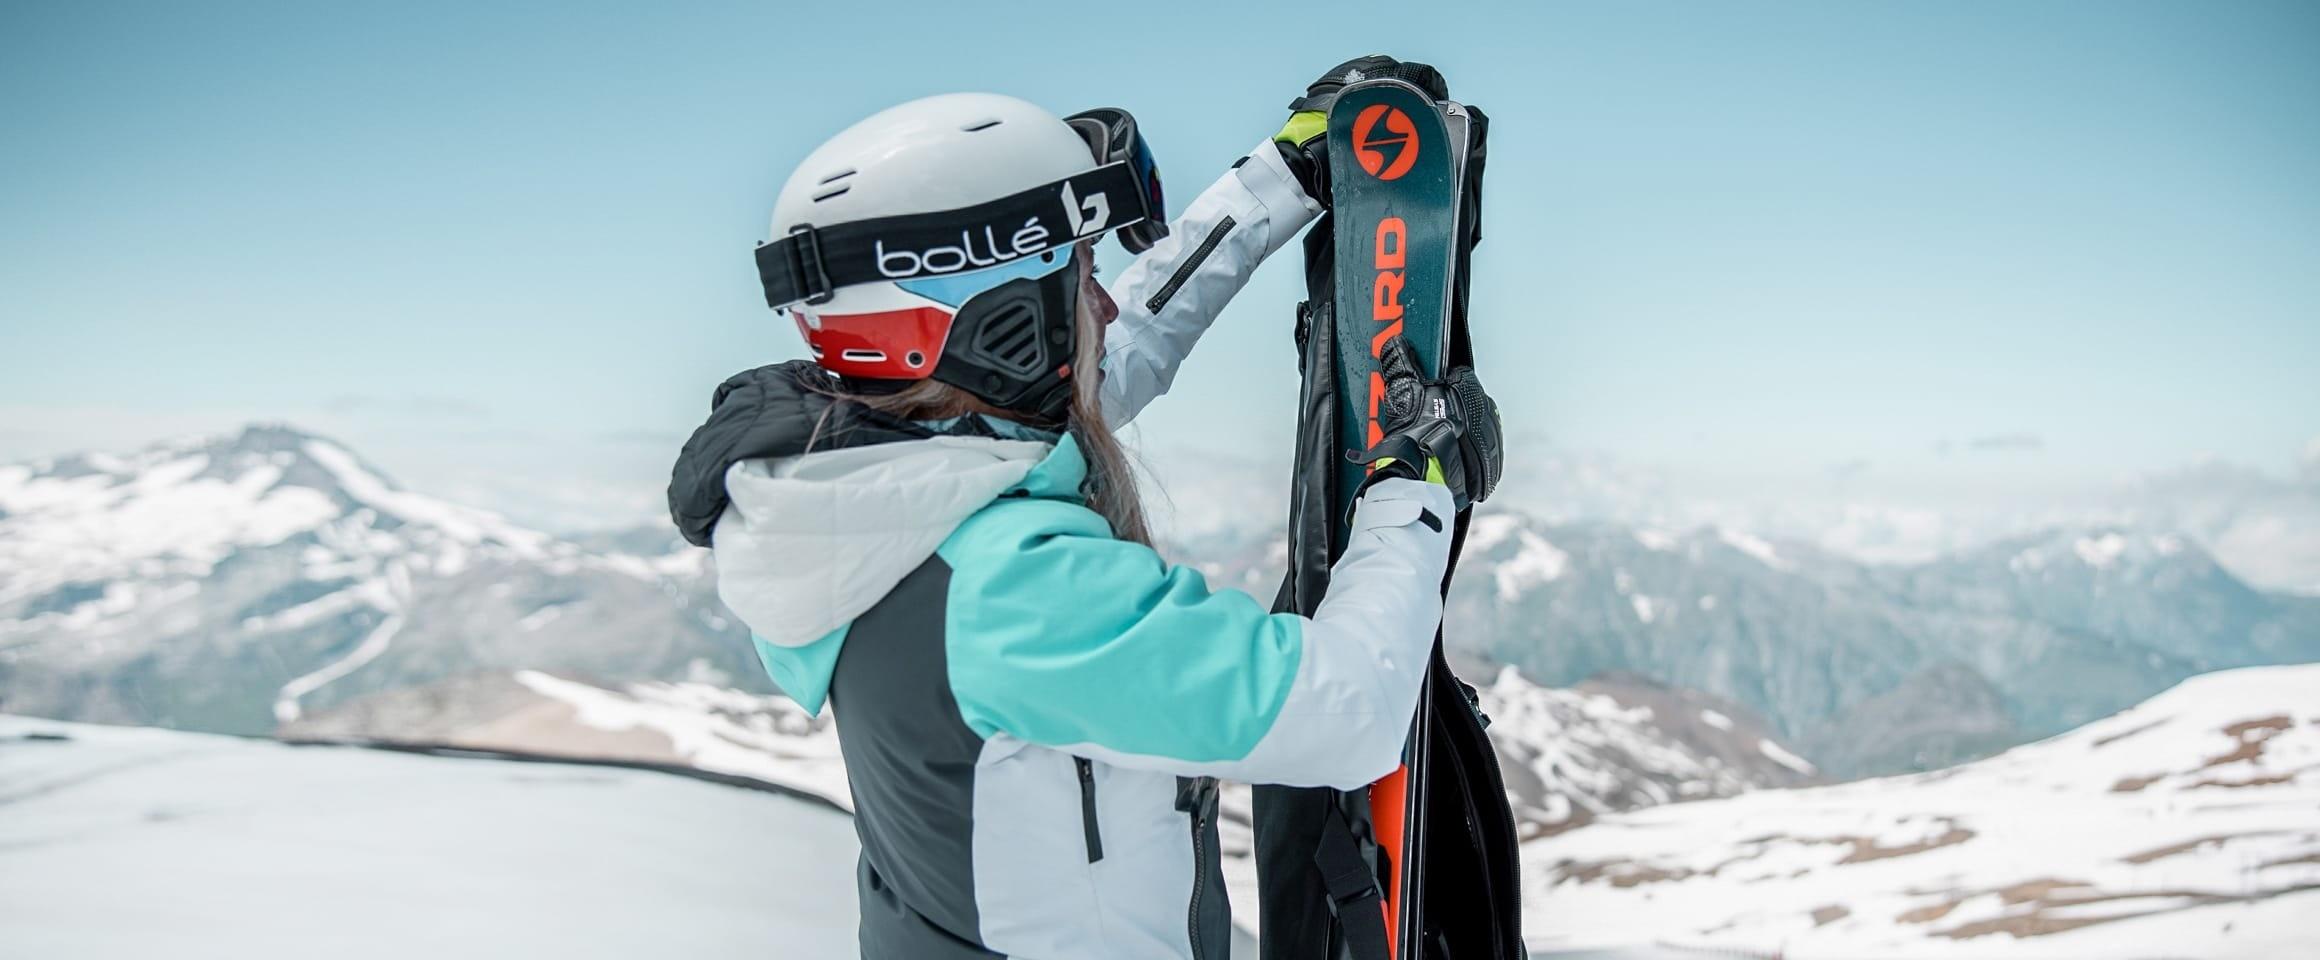 Skis Accessories Accessories